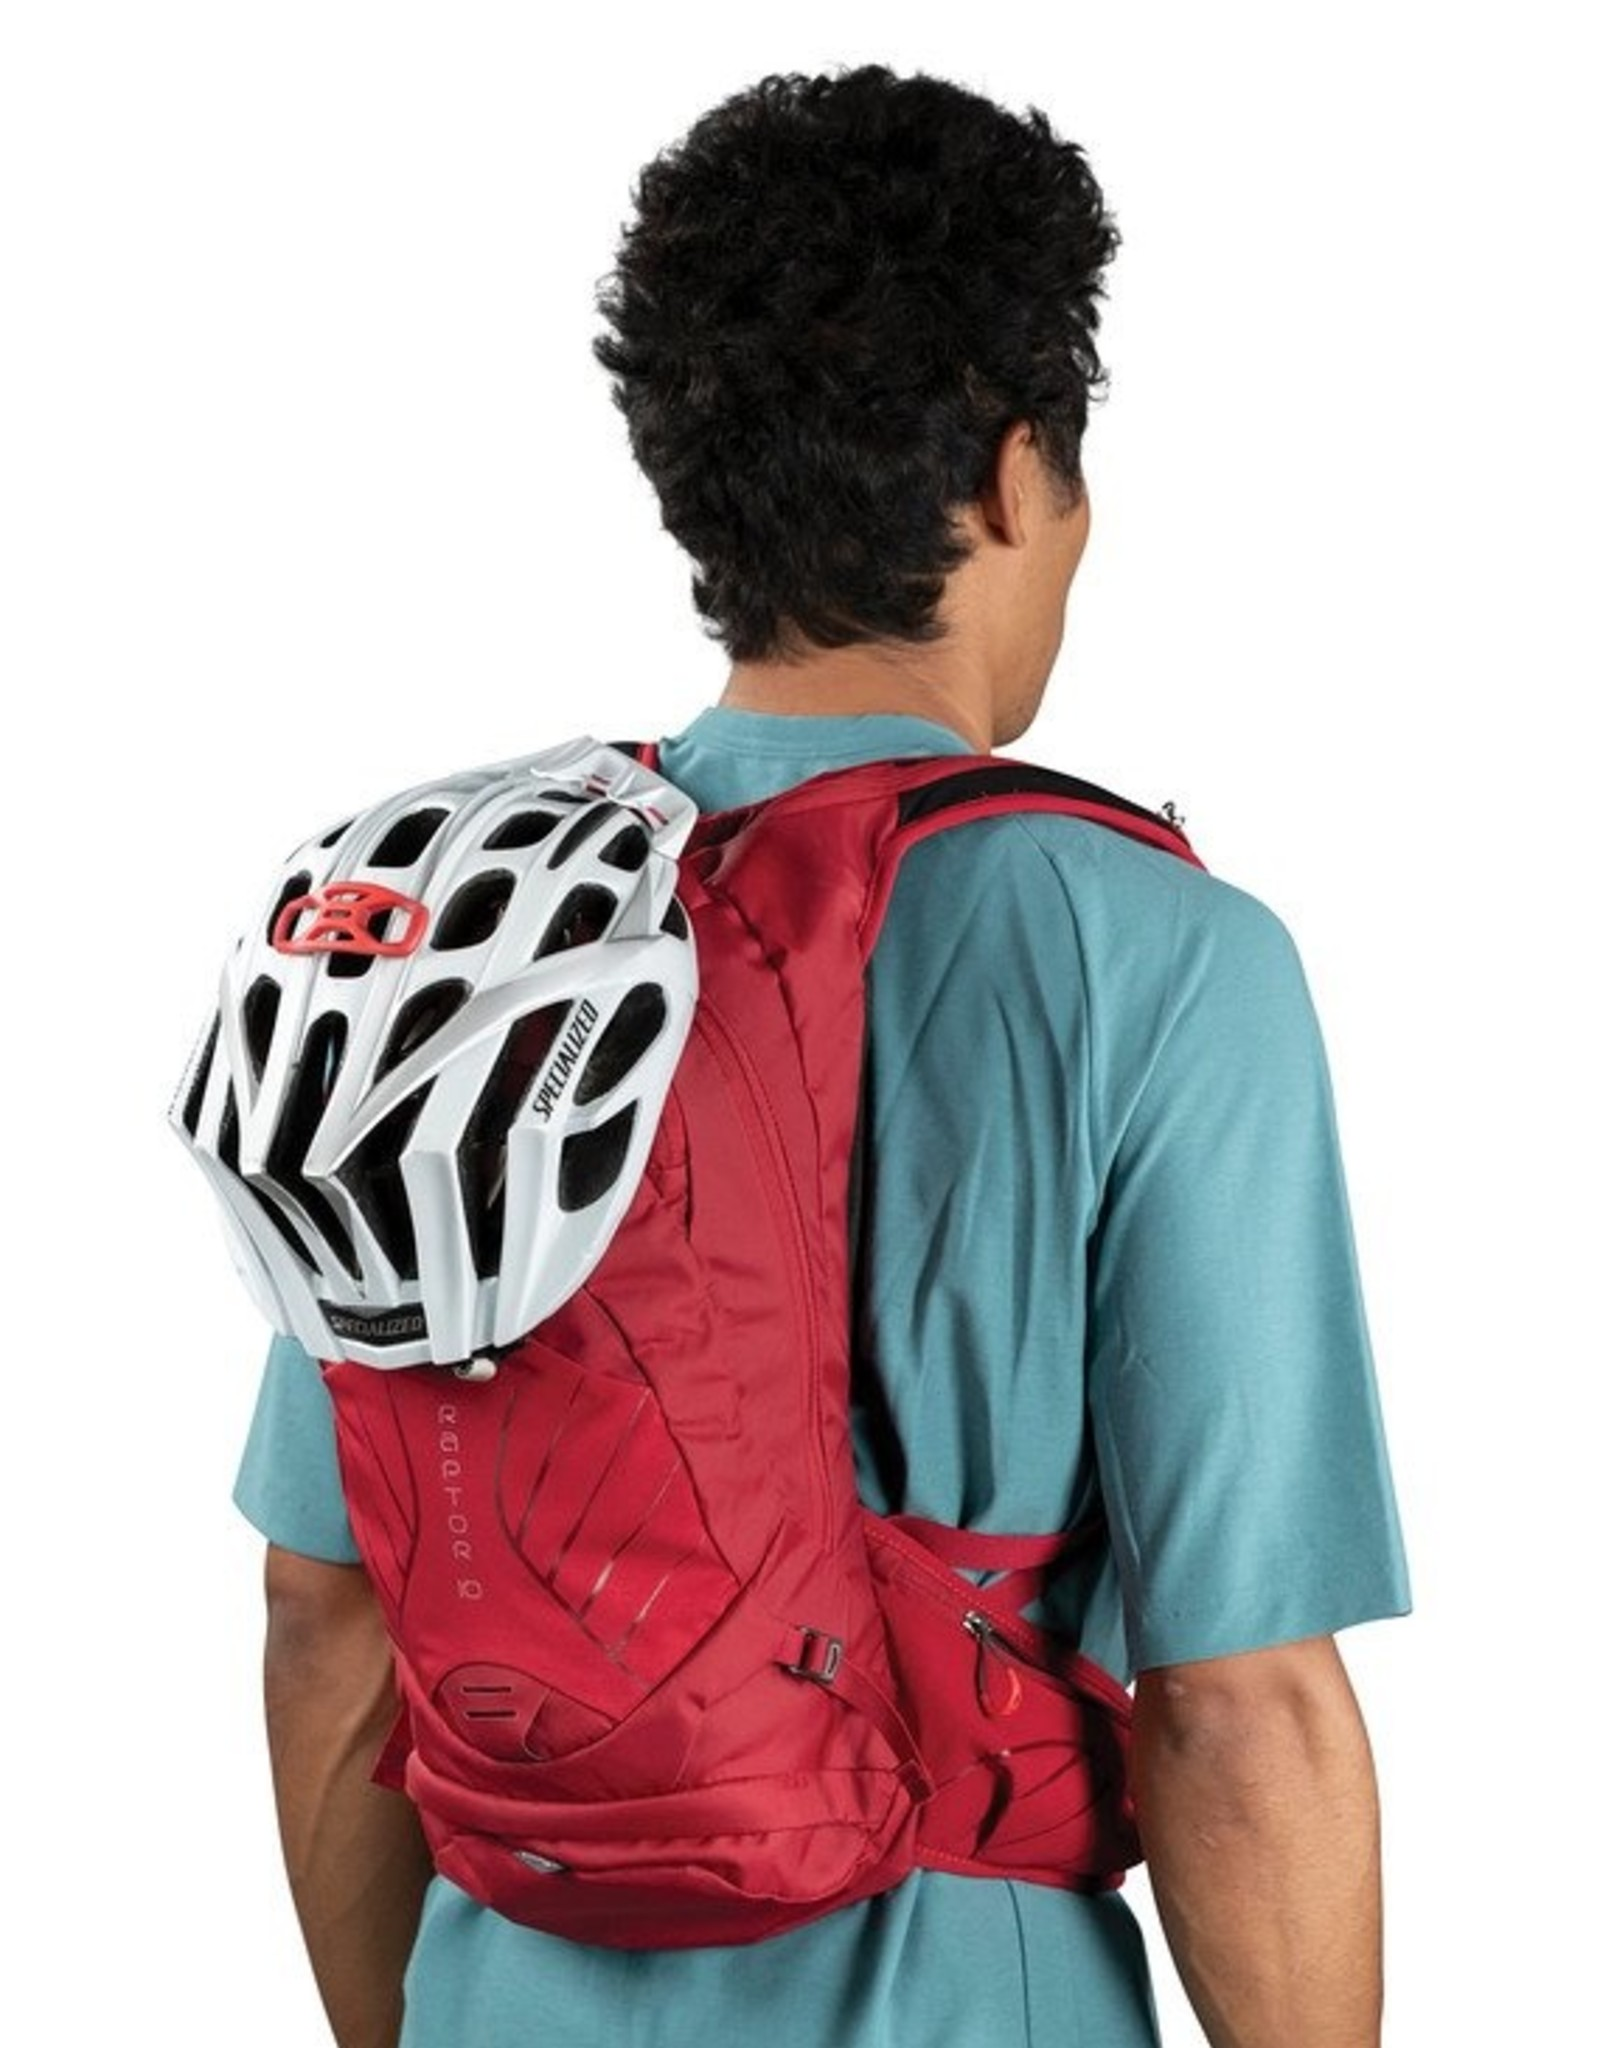 Osprey Osprey Raptor 10 Biking Pack w/Res